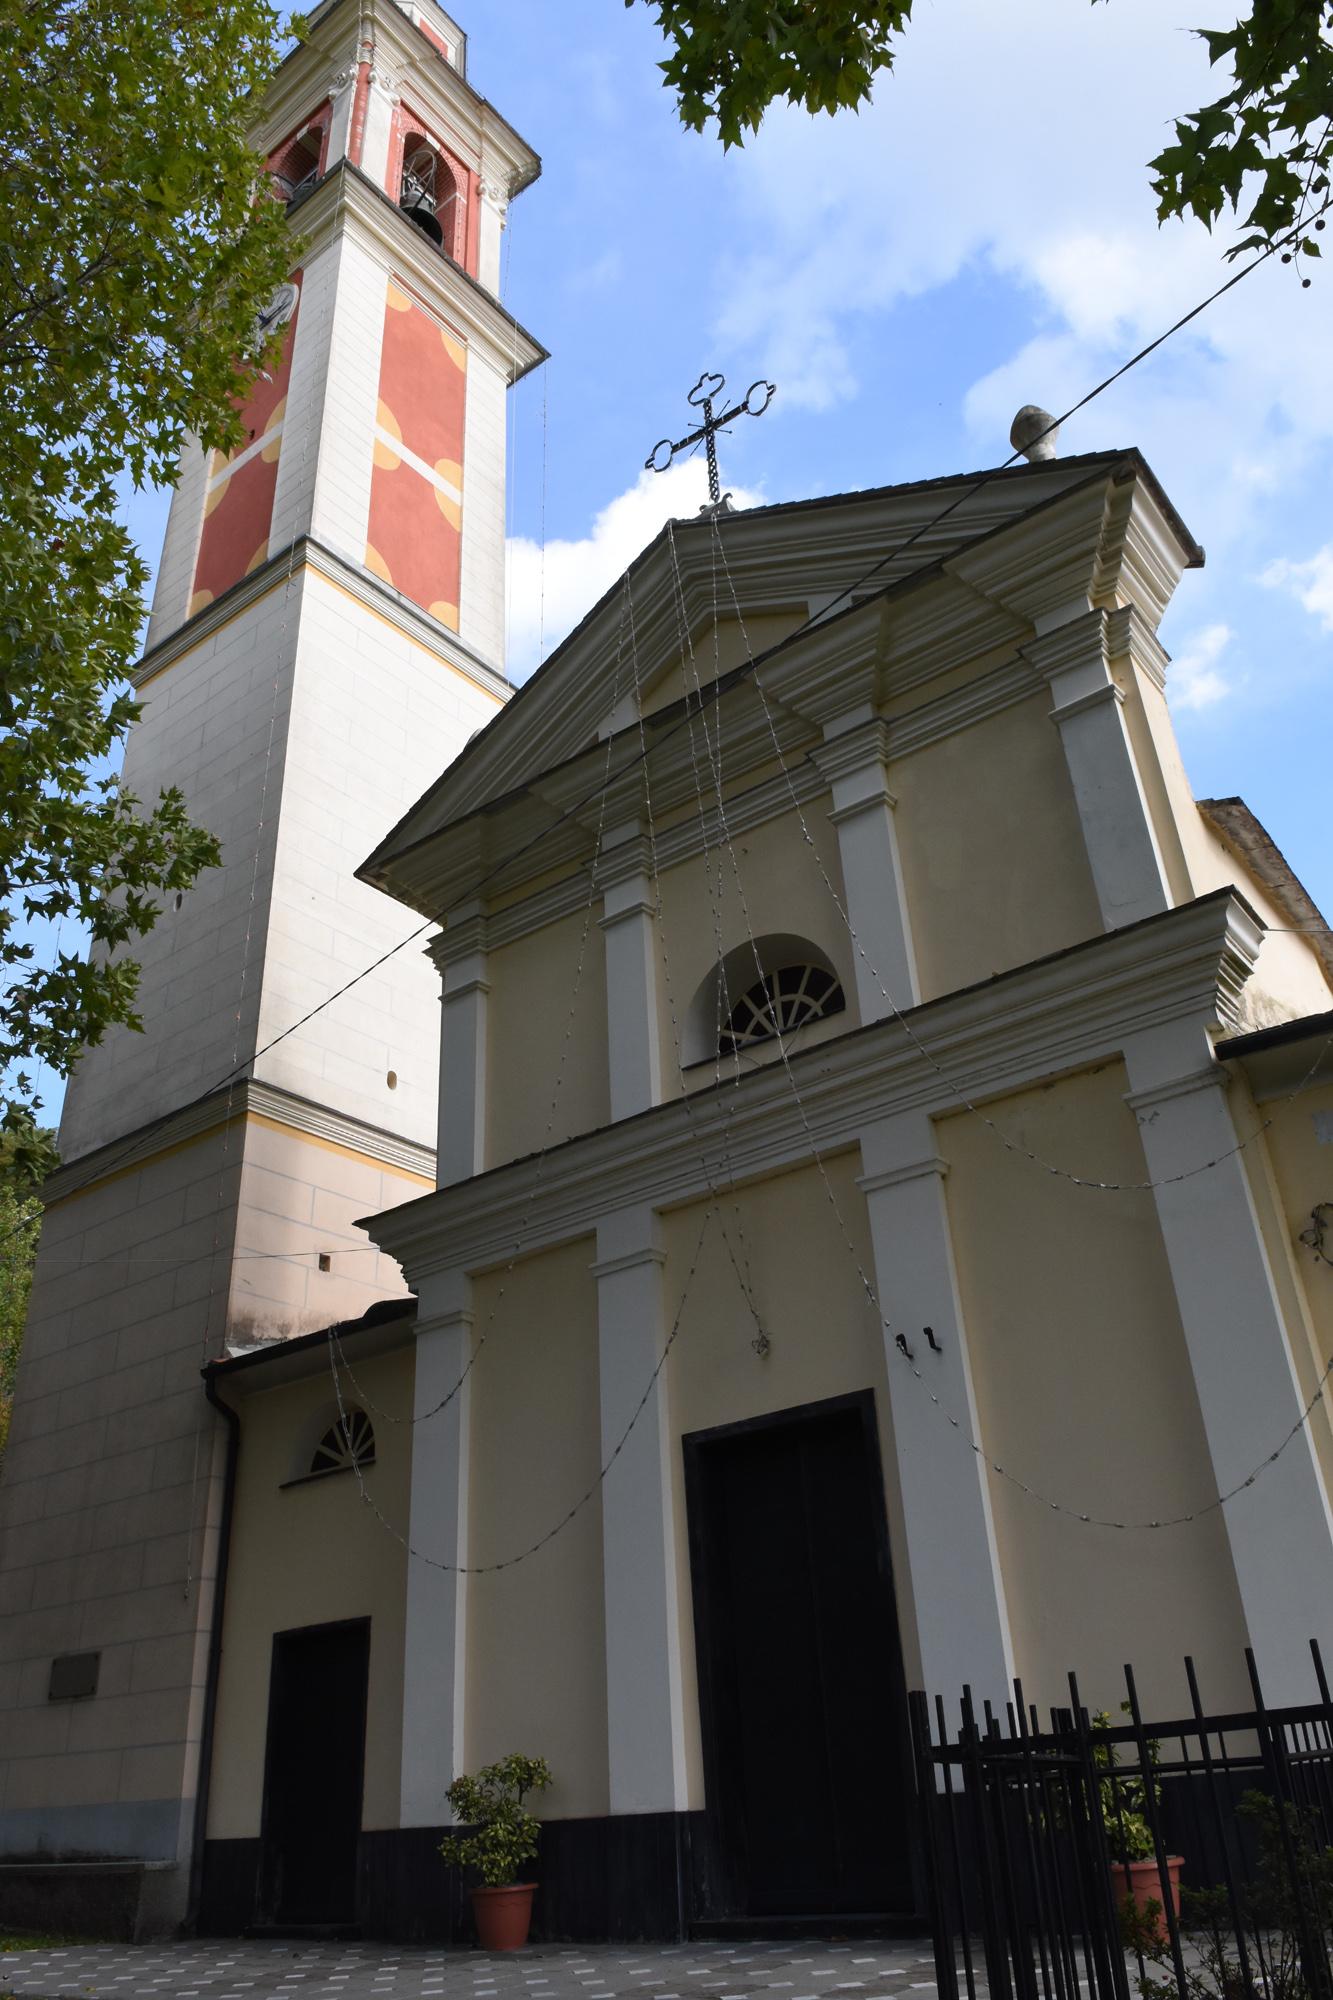 Parrocchia di San Marco D'Urri